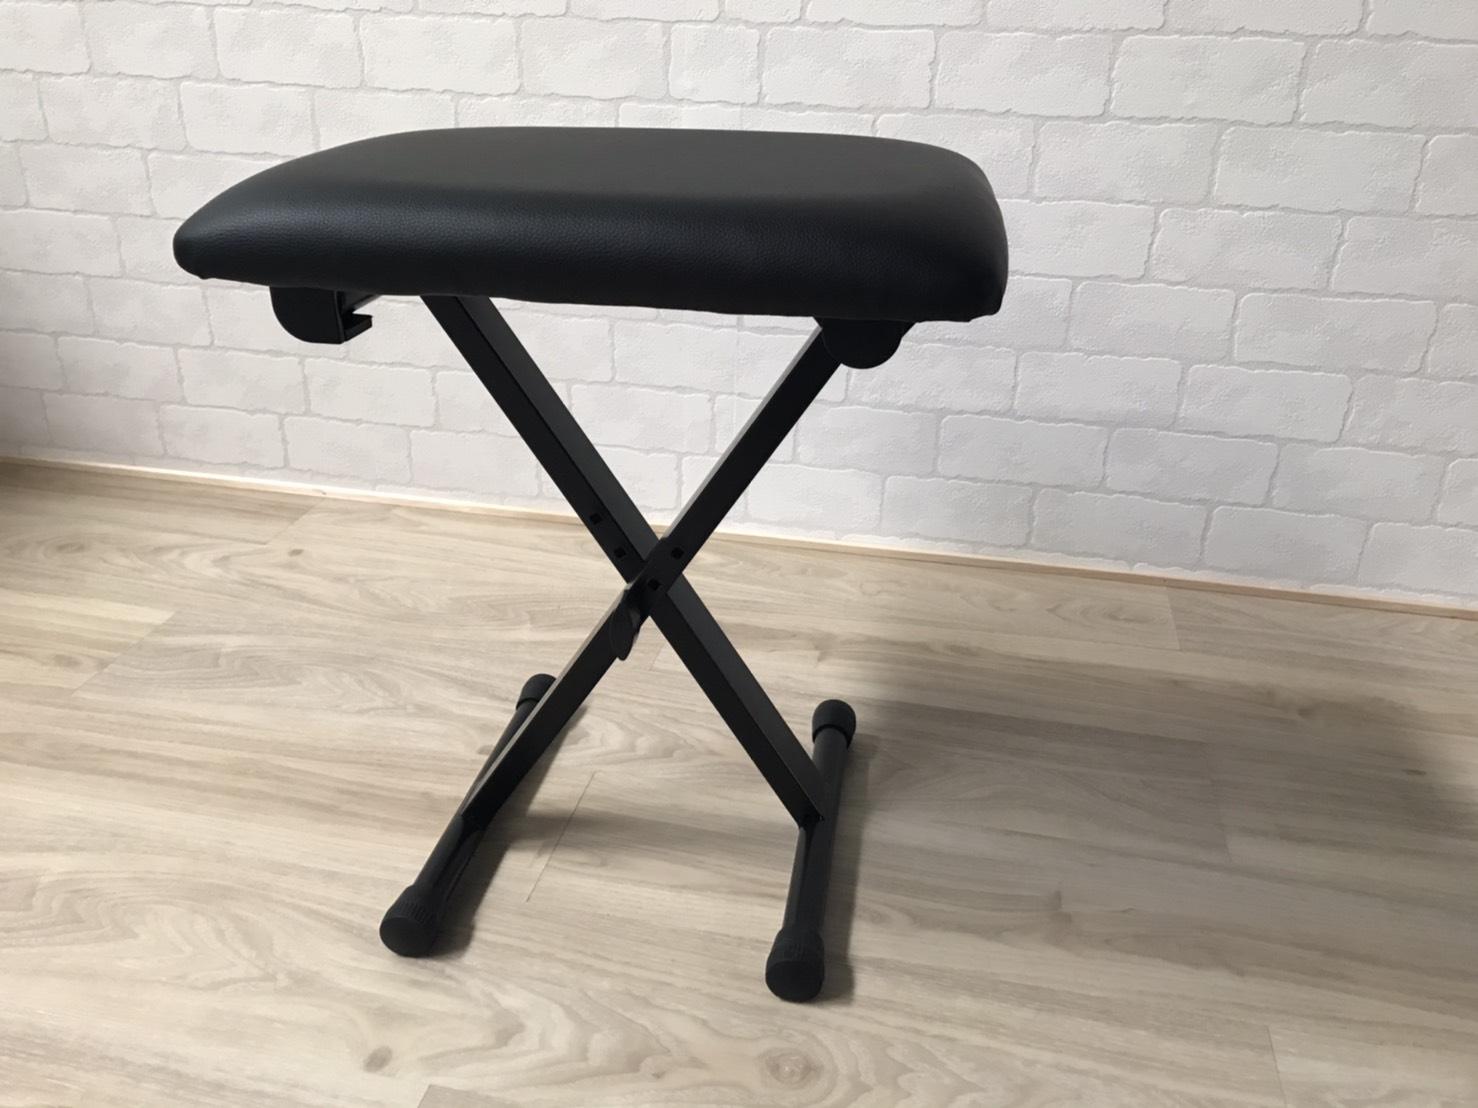 X脚タイプの椅子